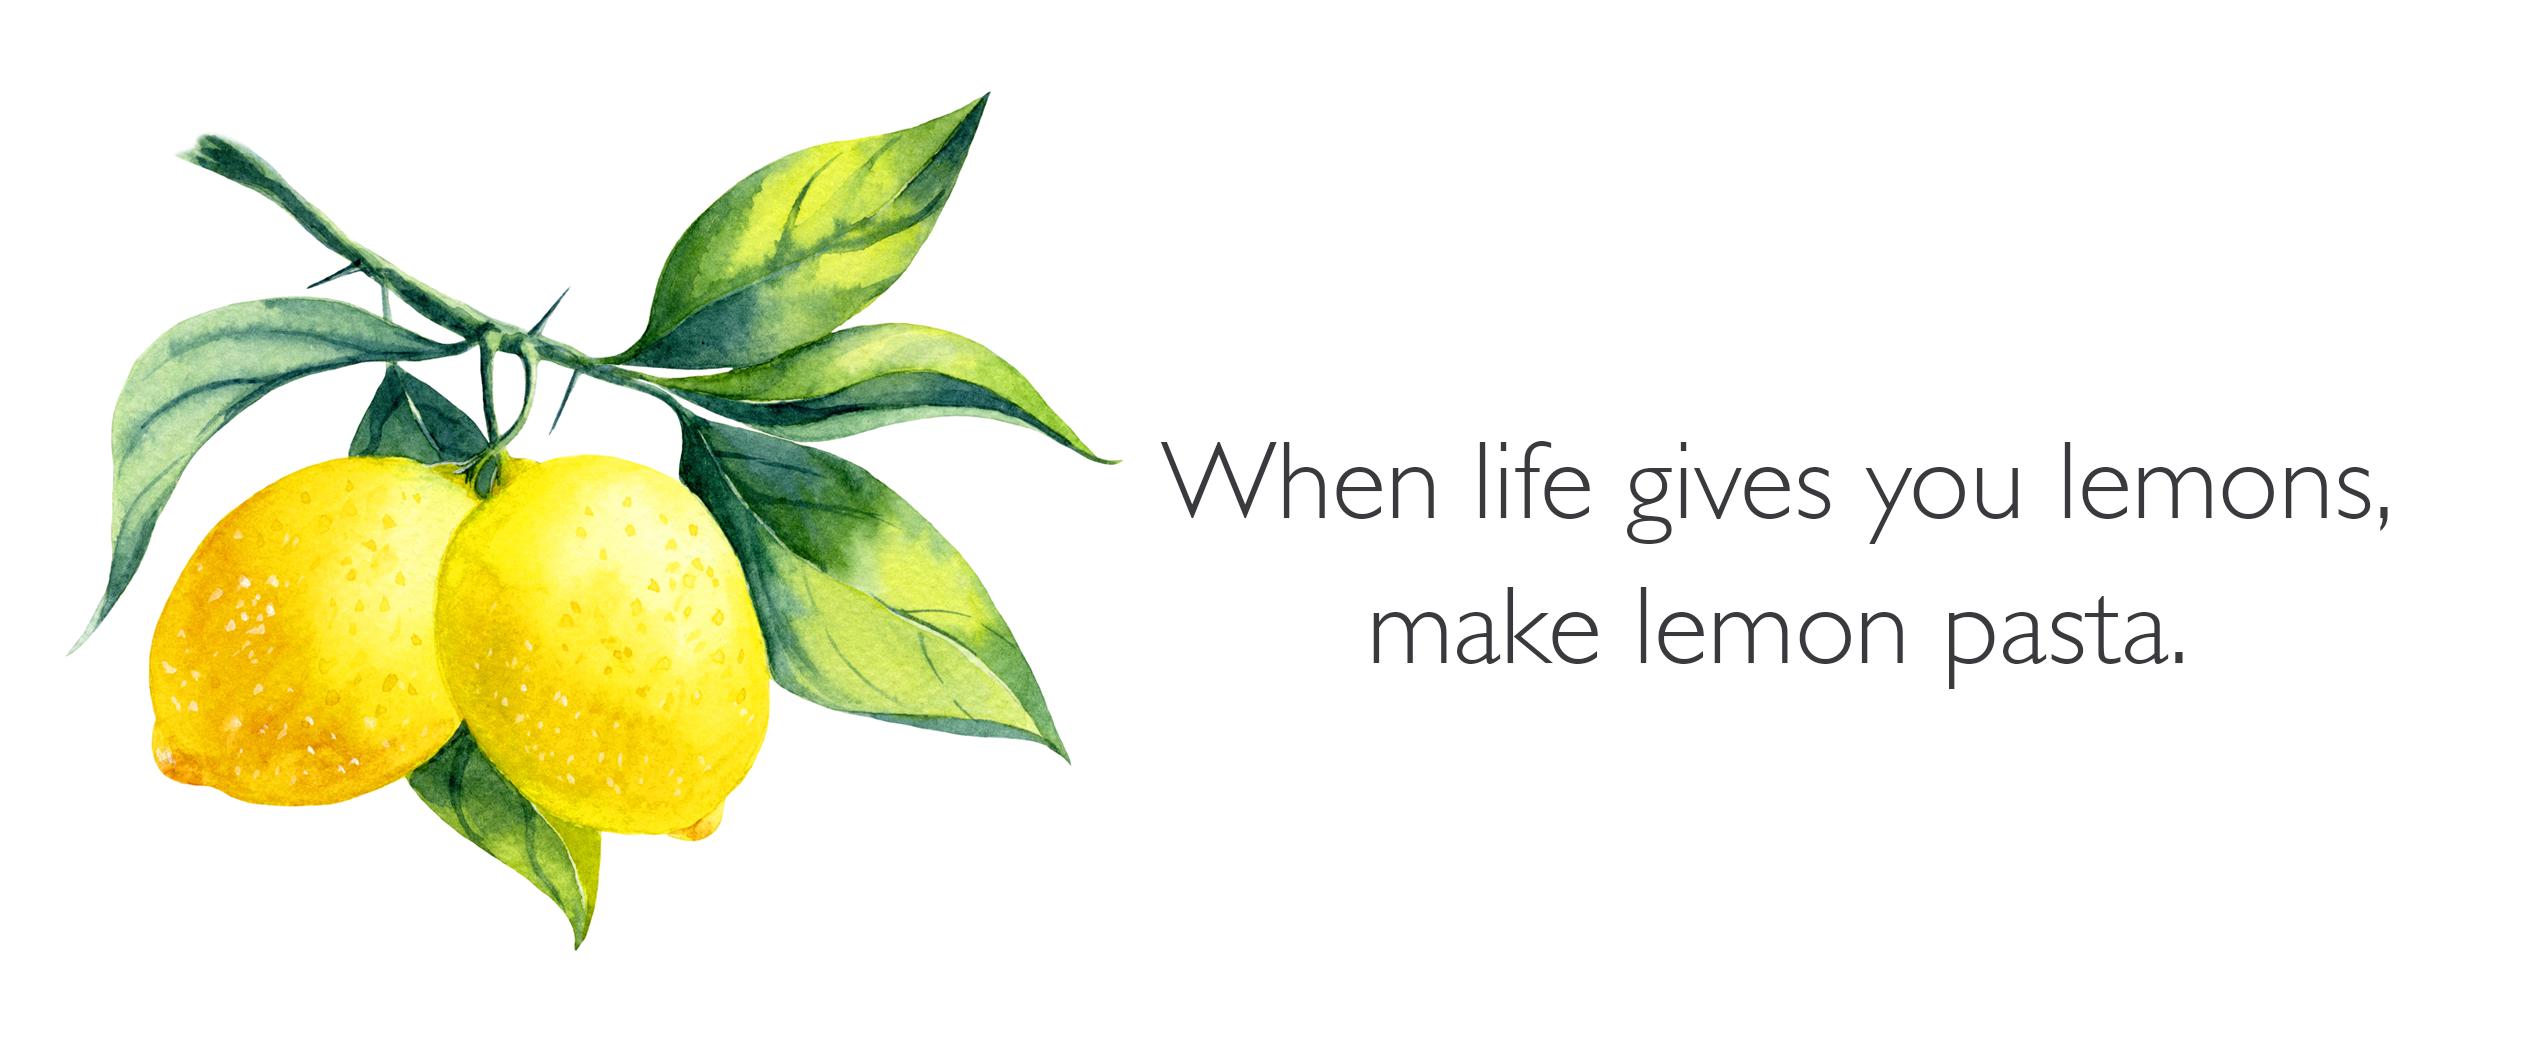 a quote, when life gives you lemons, make lemon pasta